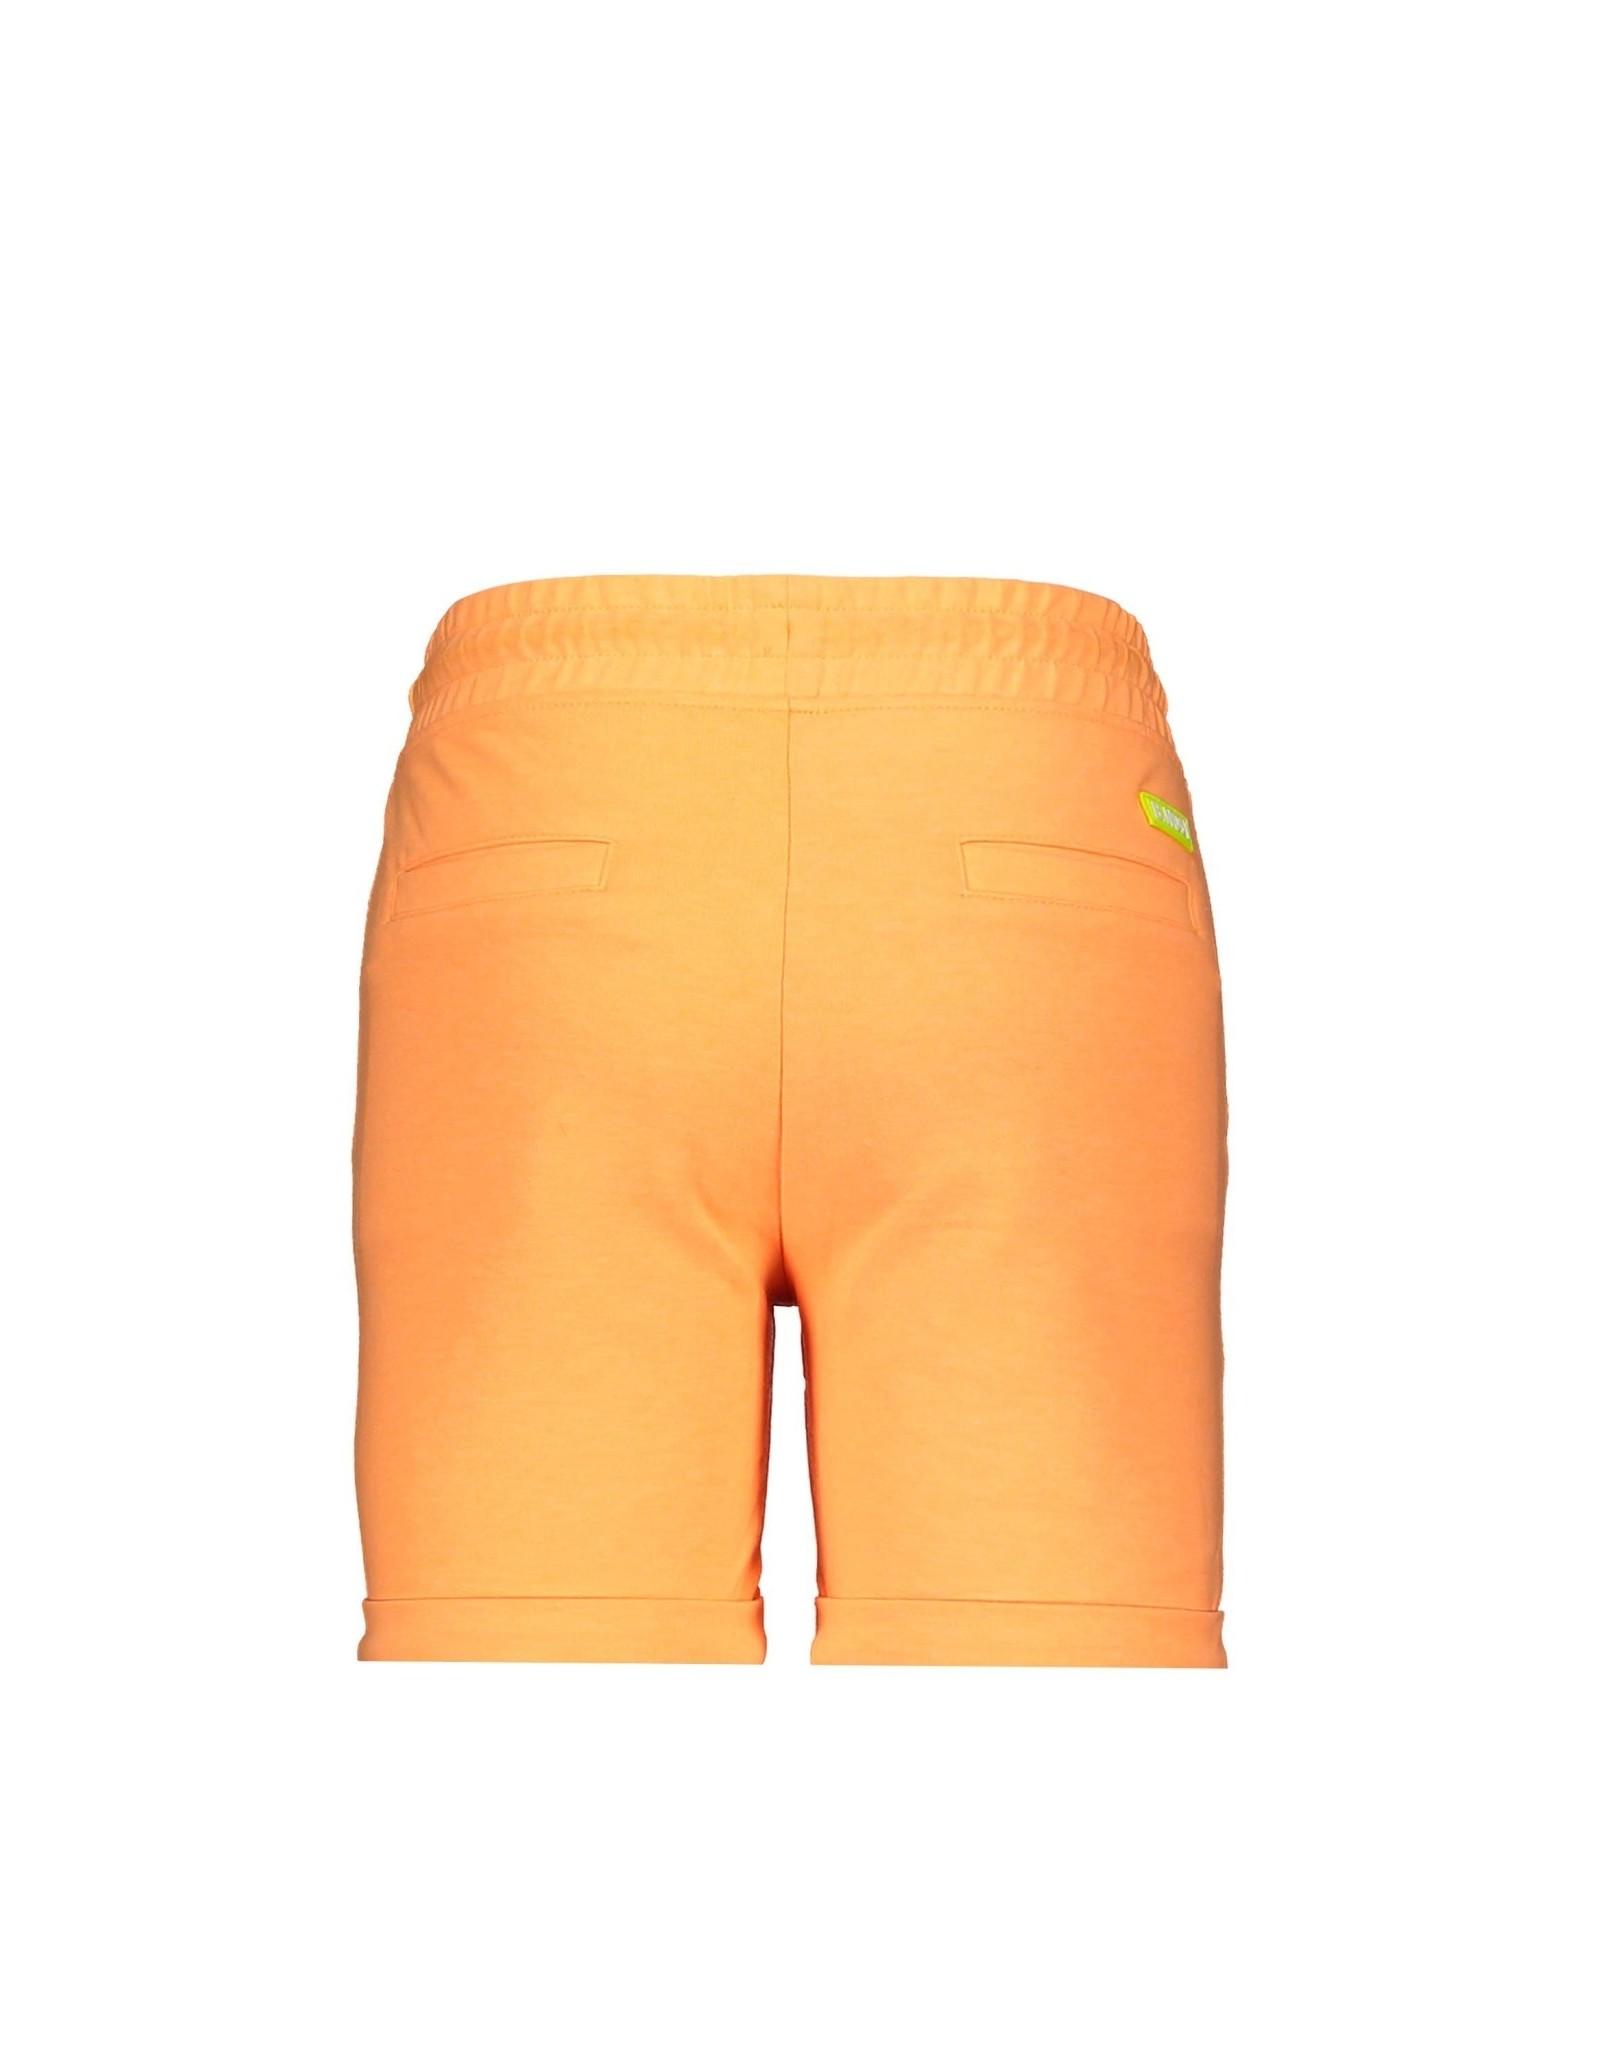 B-nosy Baby boys uni short with embro above folded hem 526 Neon orange